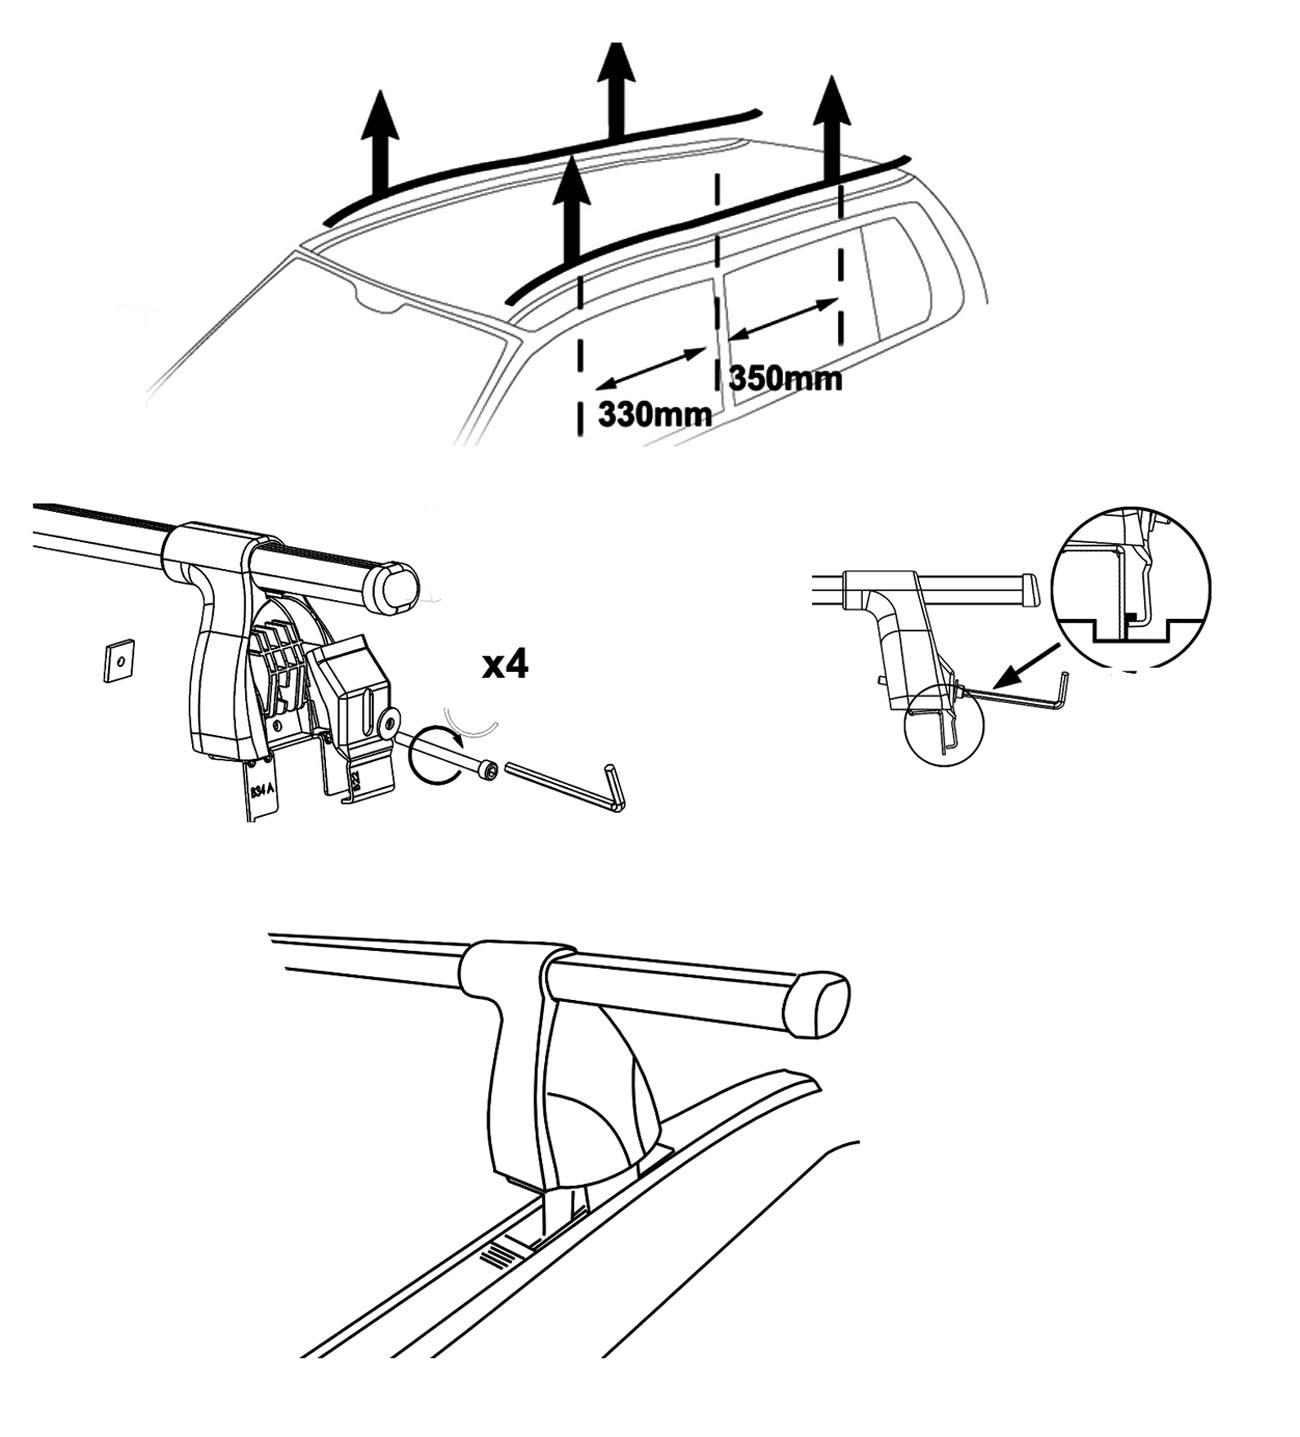 aurilis dachtr ger easy one f r ford fiesta schr gheck 3. Black Bedroom Furniture Sets. Home Design Ideas